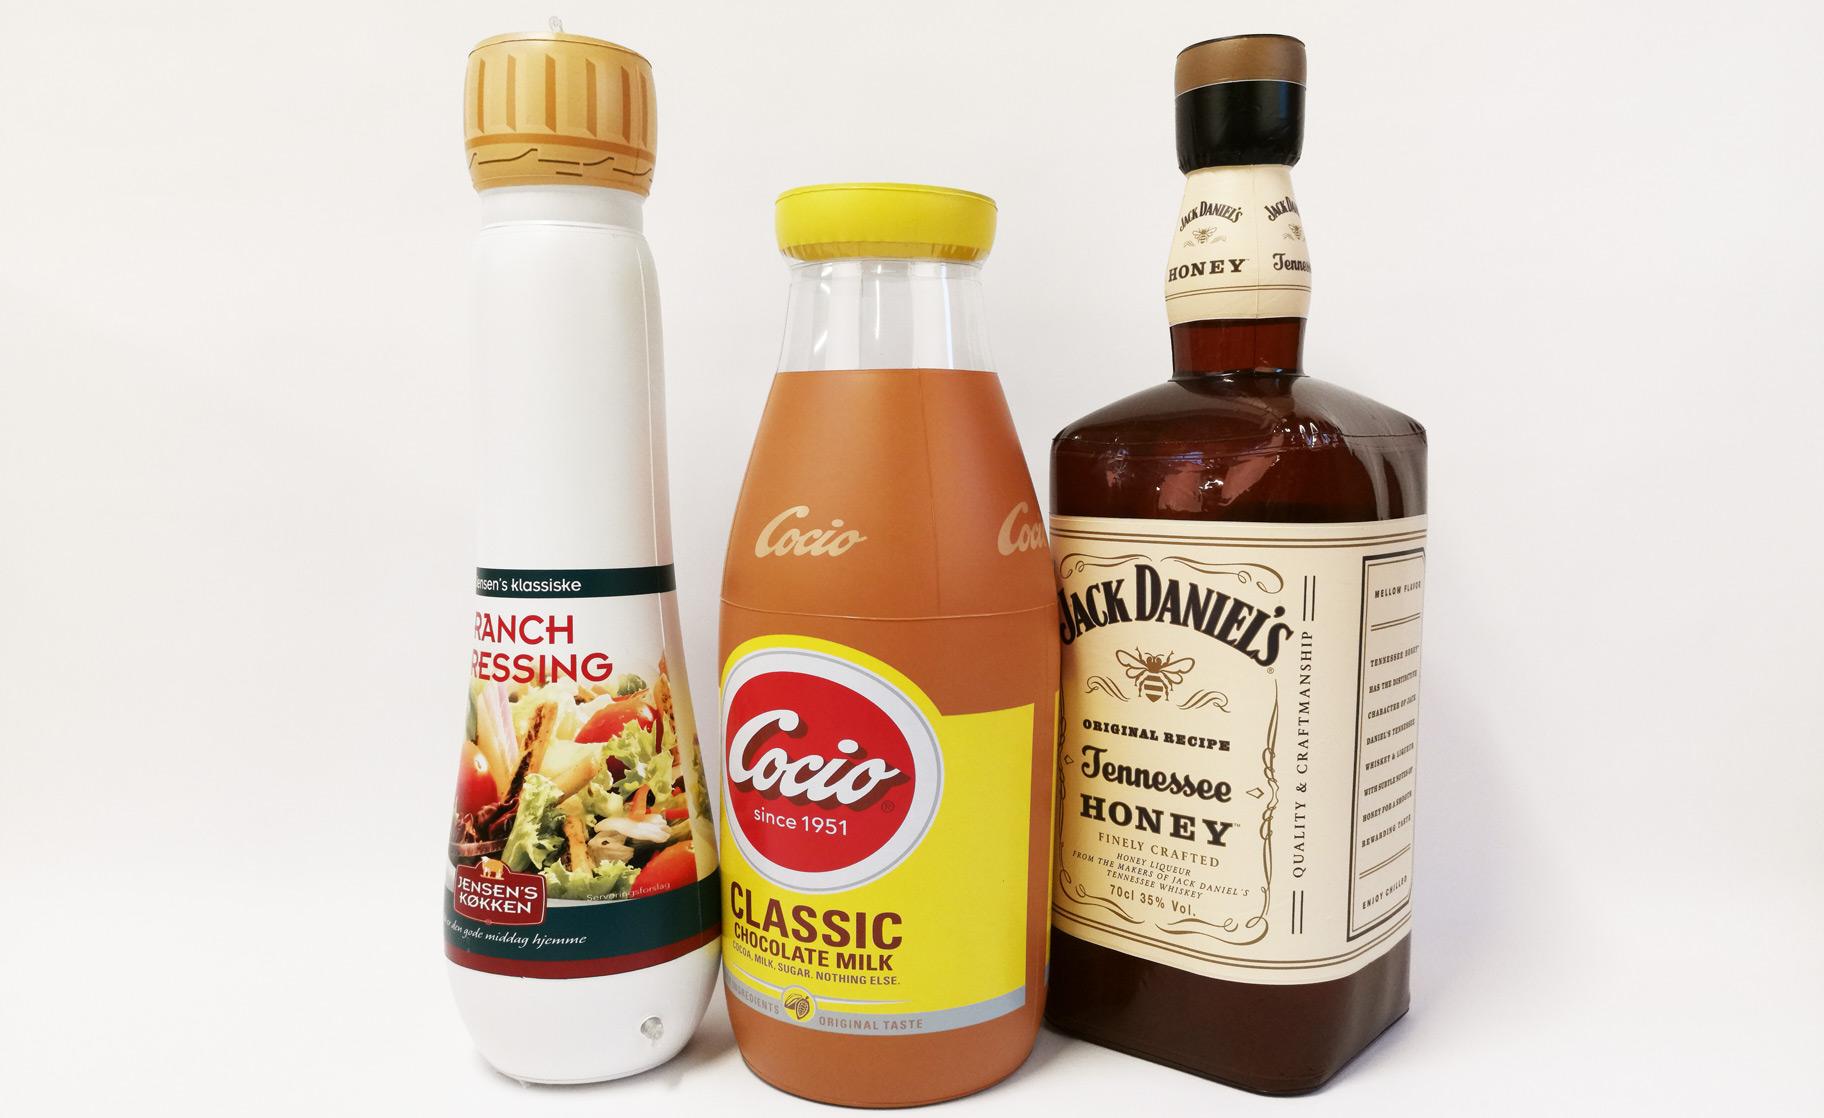 Flasker som oppustelig reklameeffekter